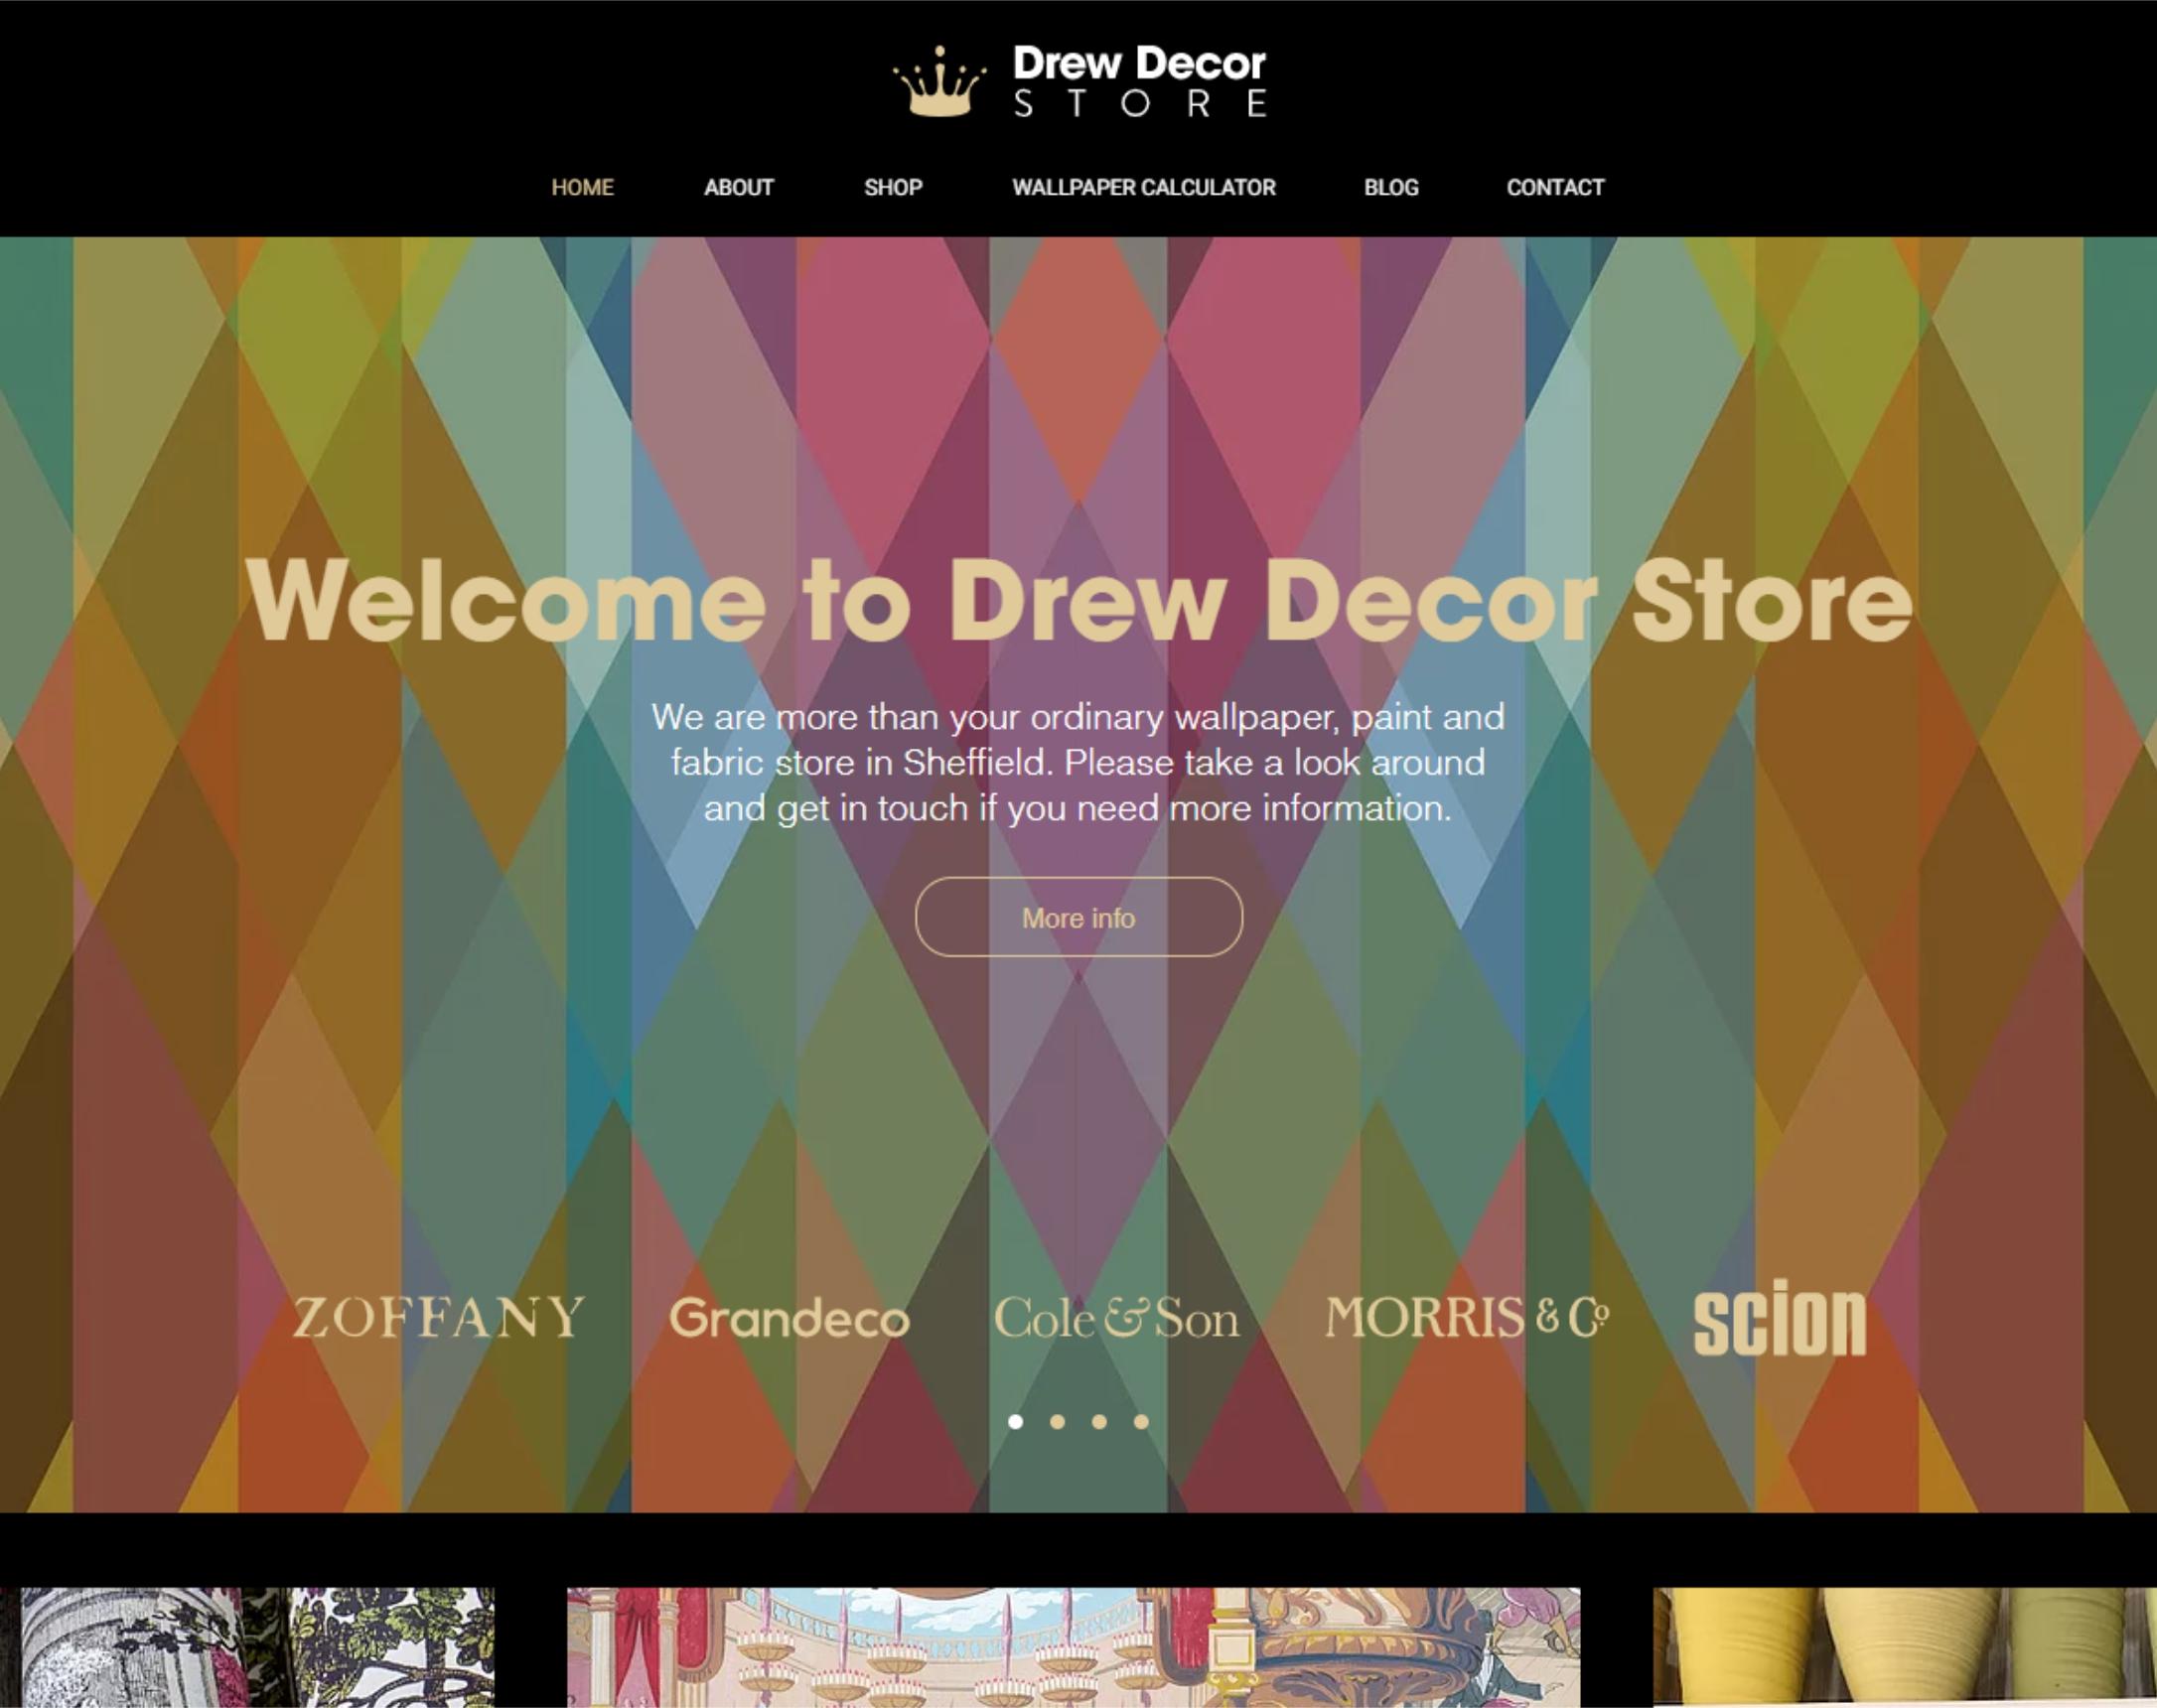 Drew Decor Store Drew Decor Store is a small, family run business l...